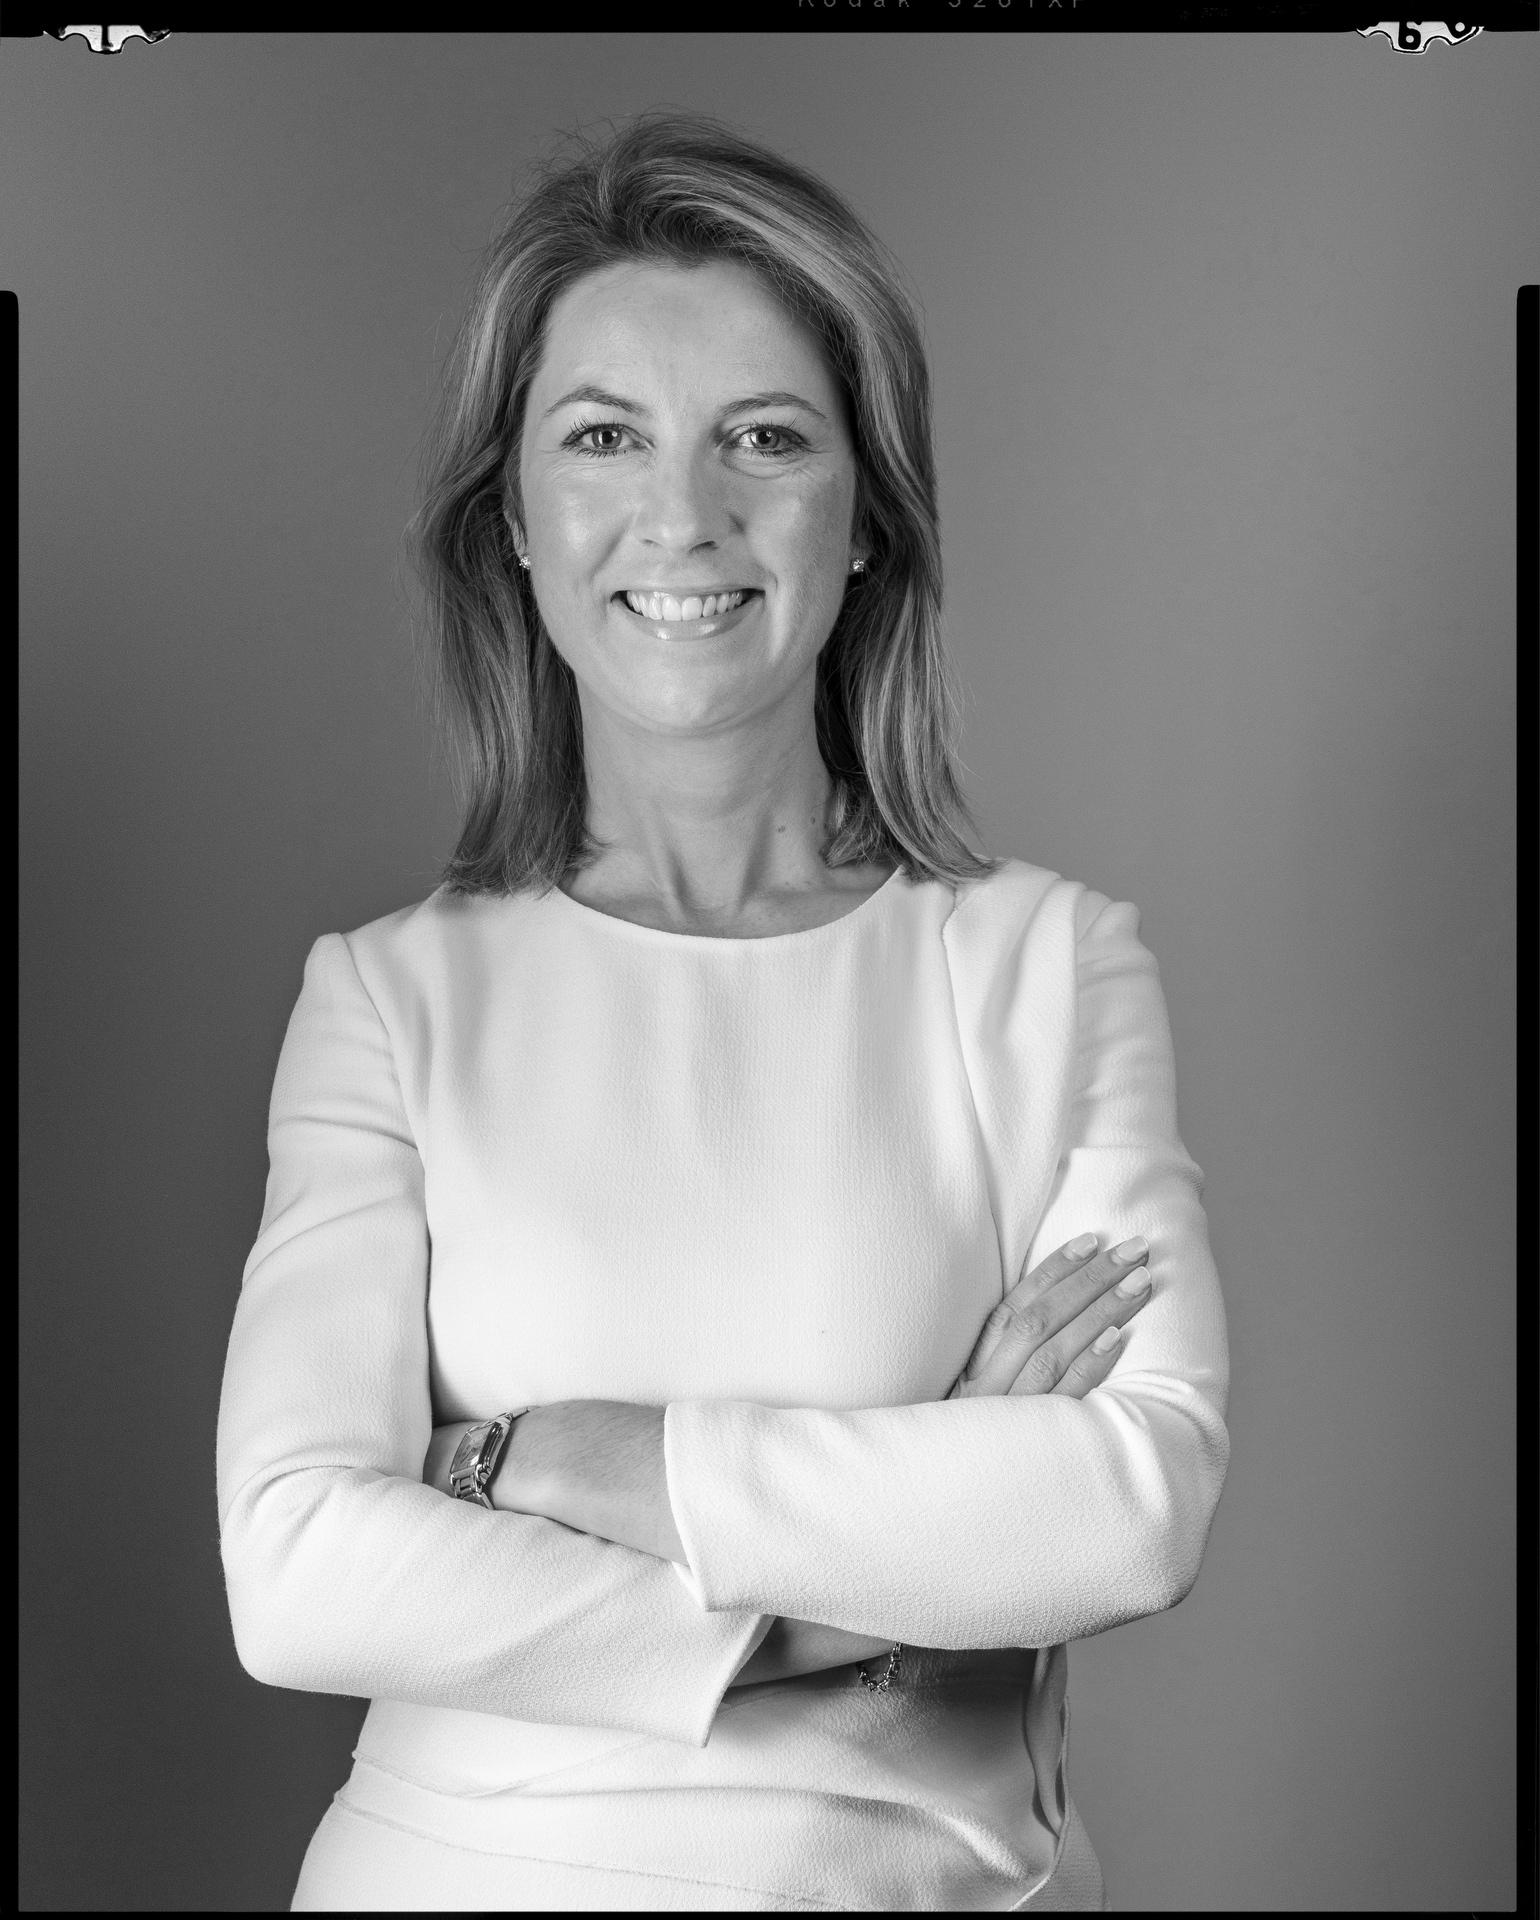 Sydney portrait photographer, personal branding, head shots, corporate photography, board memeber